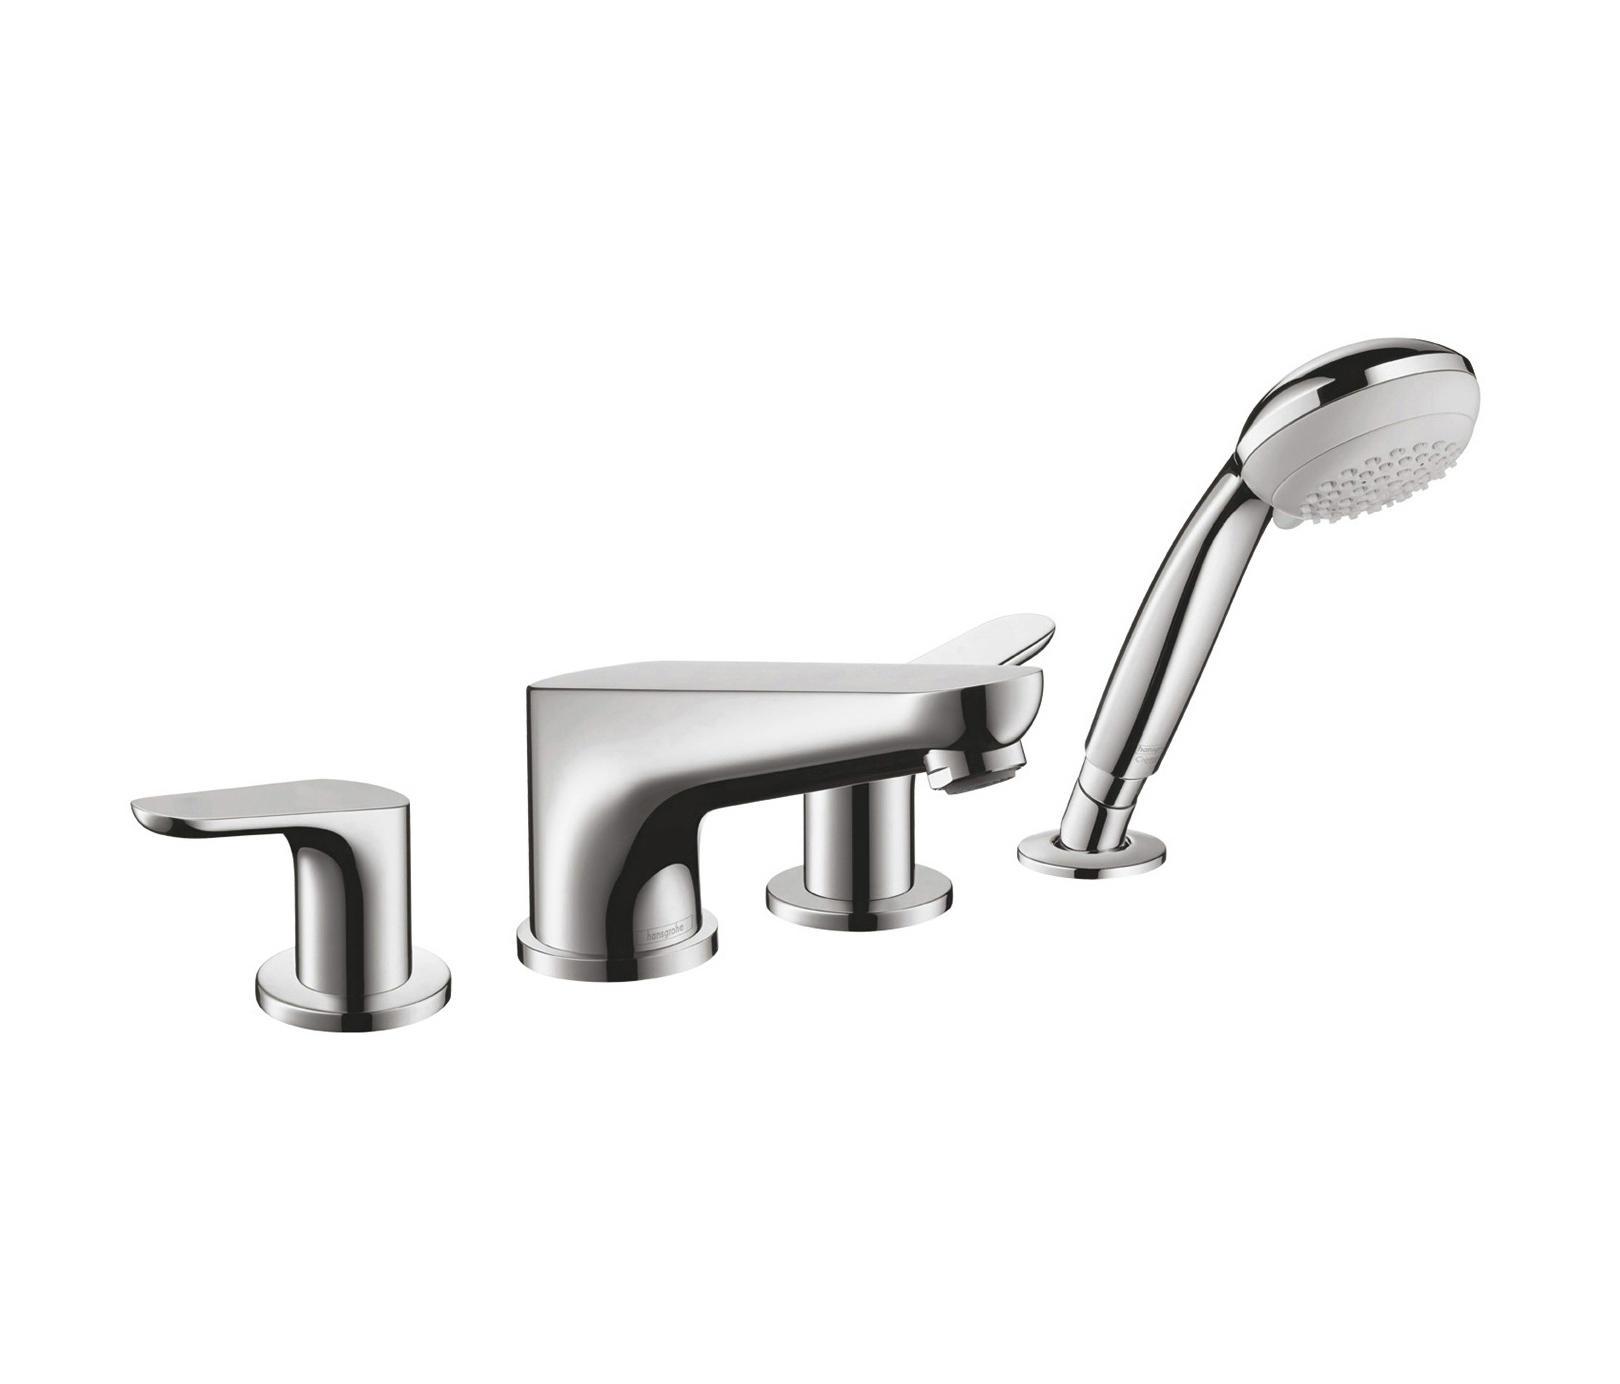 hansgrohe focus 4 hole rim mounted bath mixer bath taps. Black Bedroom Furniture Sets. Home Design Ideas